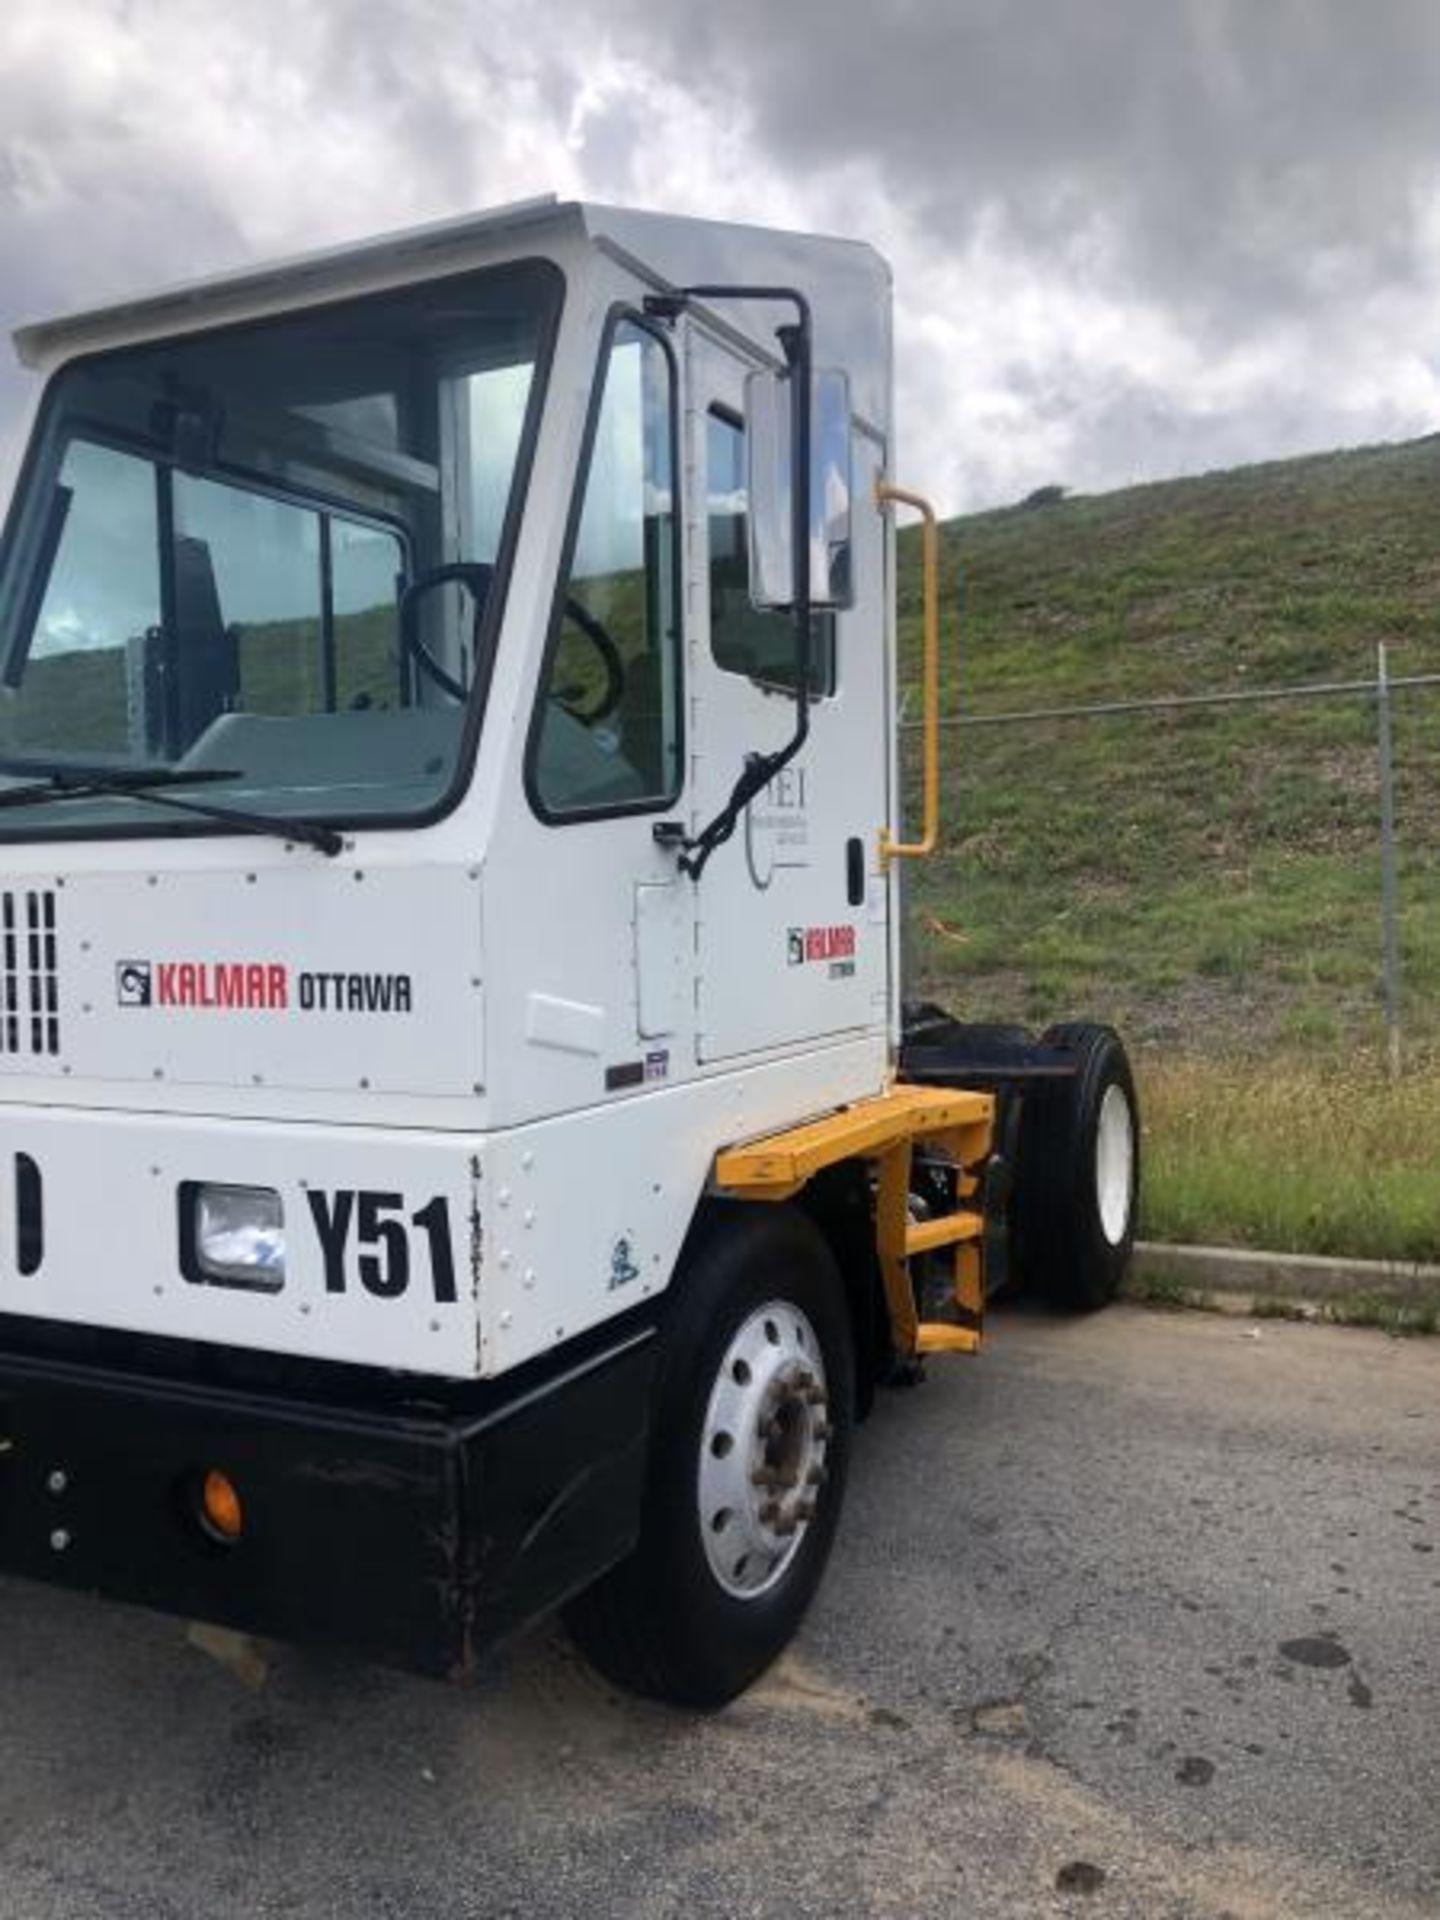 2015 Kalmar Ottawa 4x2 Yard Truck , SN: 338845 2,600.5 Hours, 185 Miles - Image 3 of 27